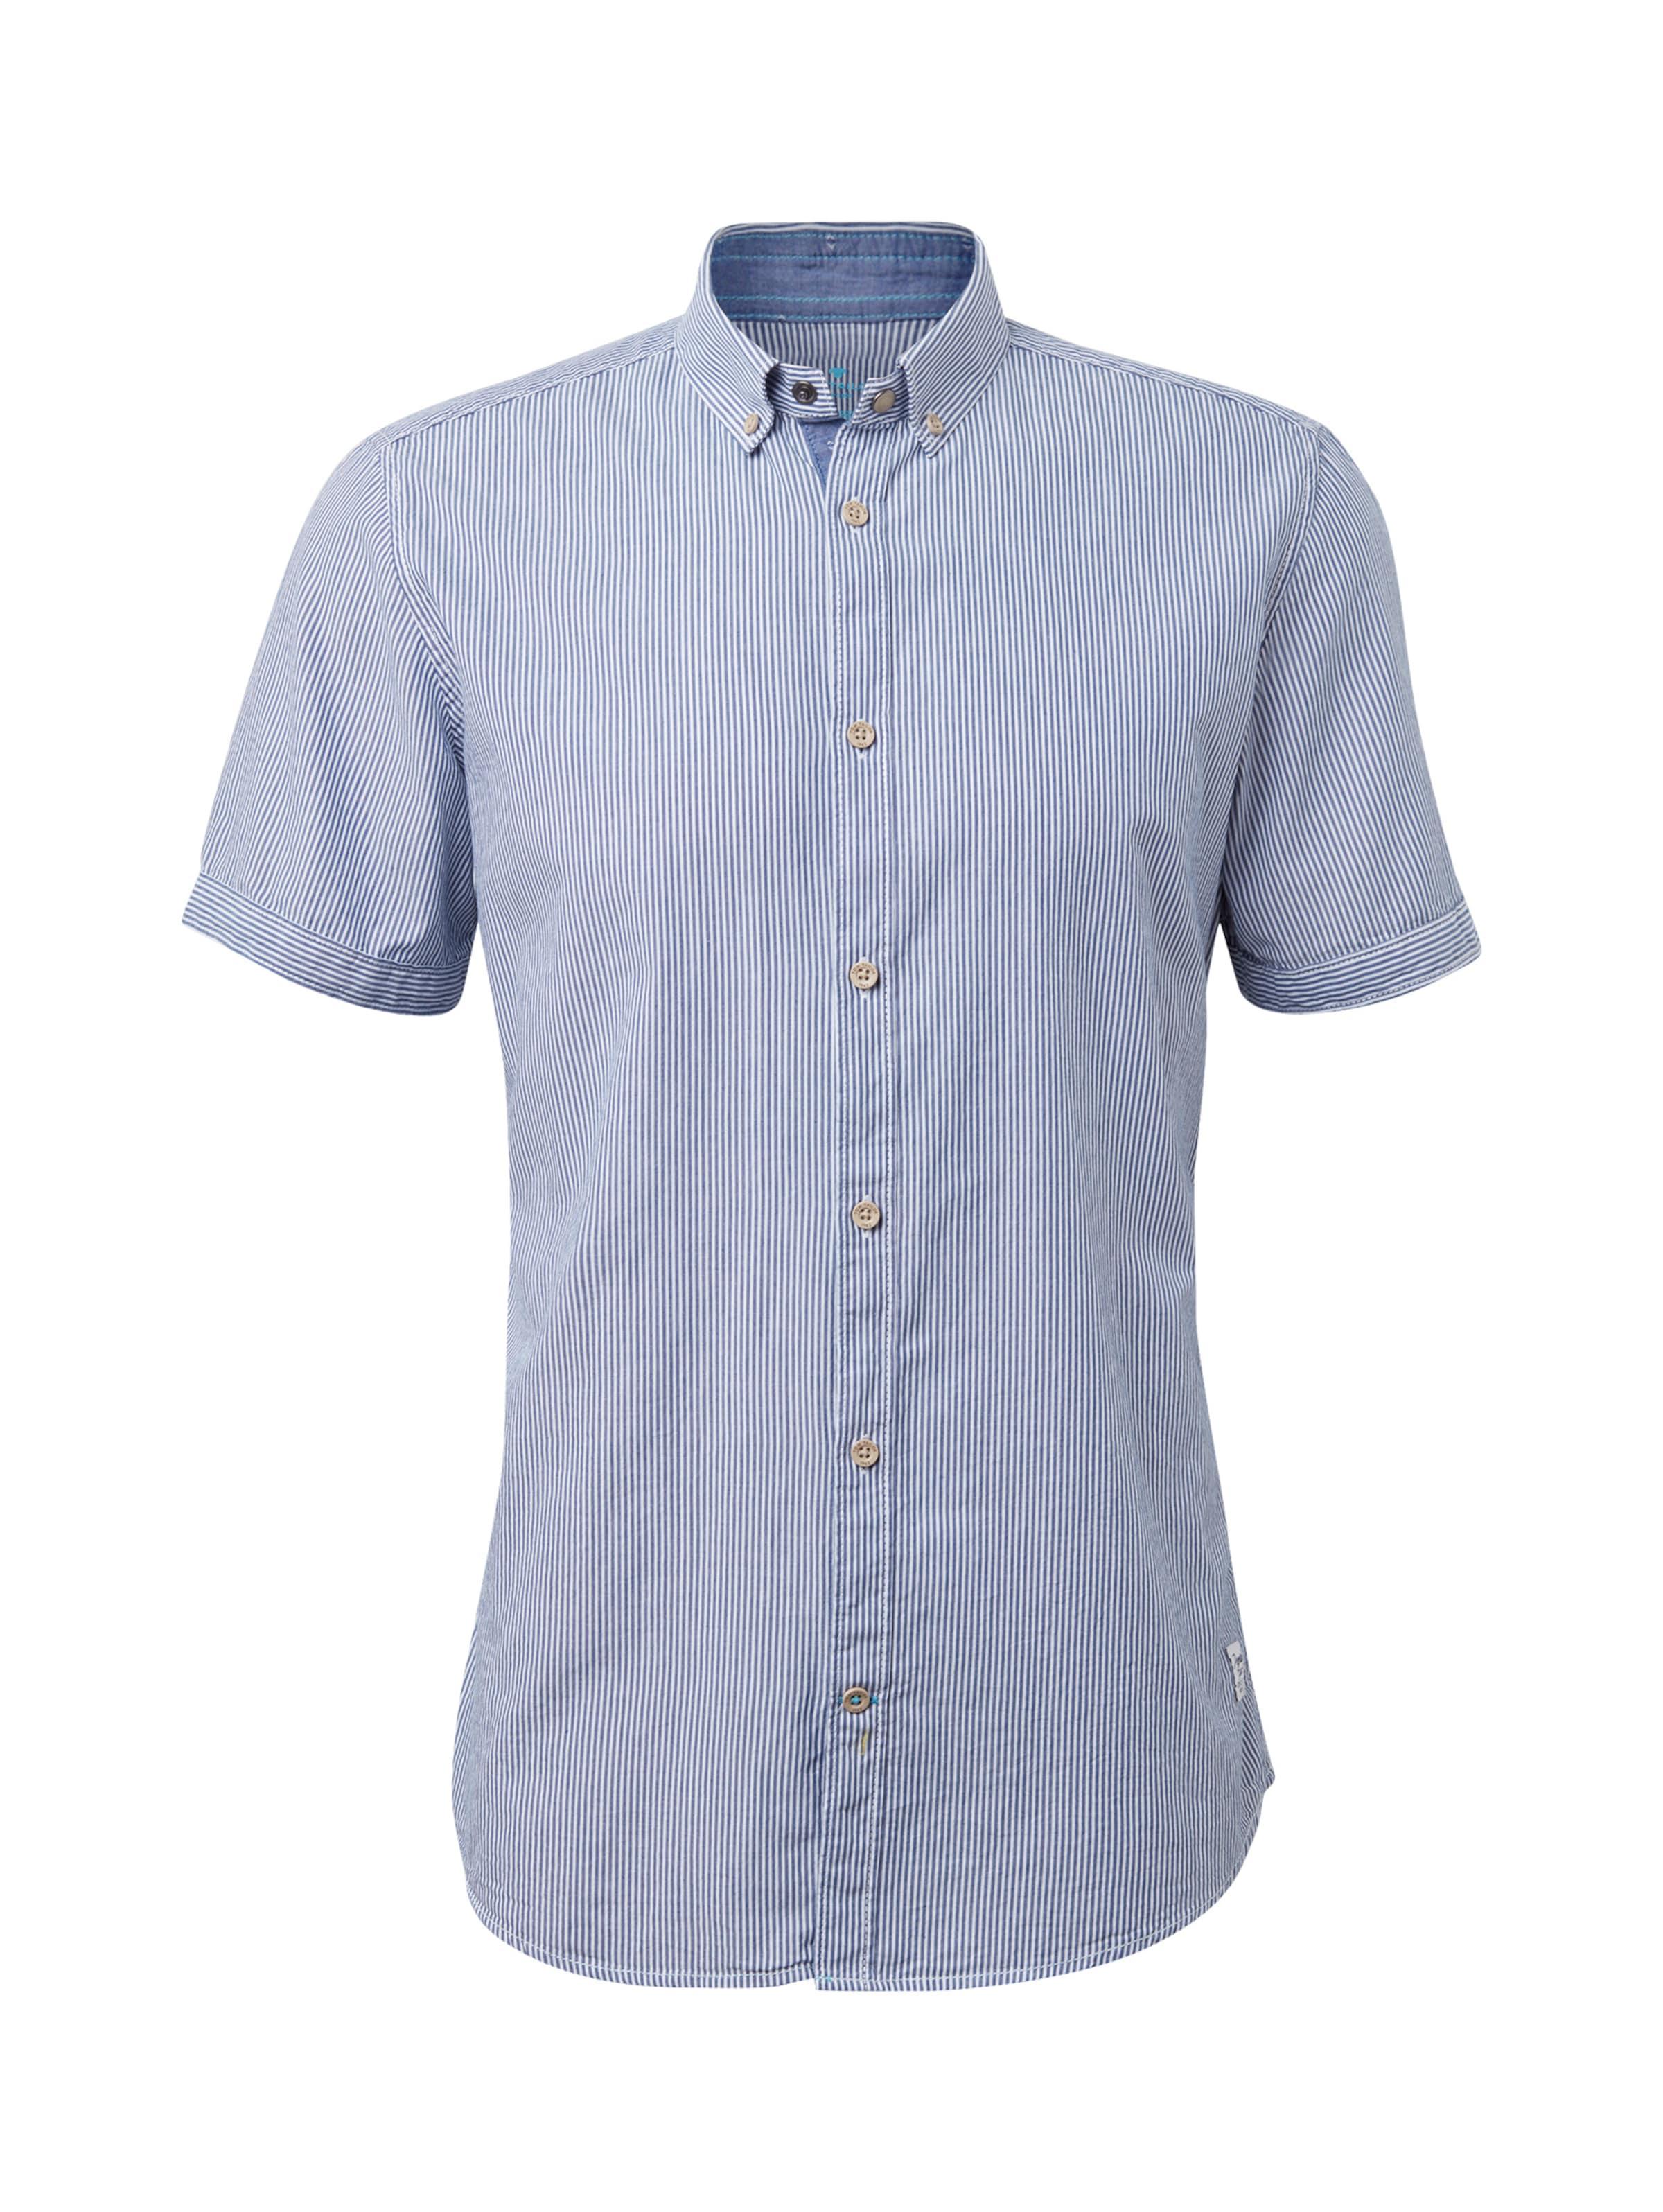 Kurzarmhemd Tom In Tailor Tom Tailor Kurzarmhemd Blau pqLSUGzMV